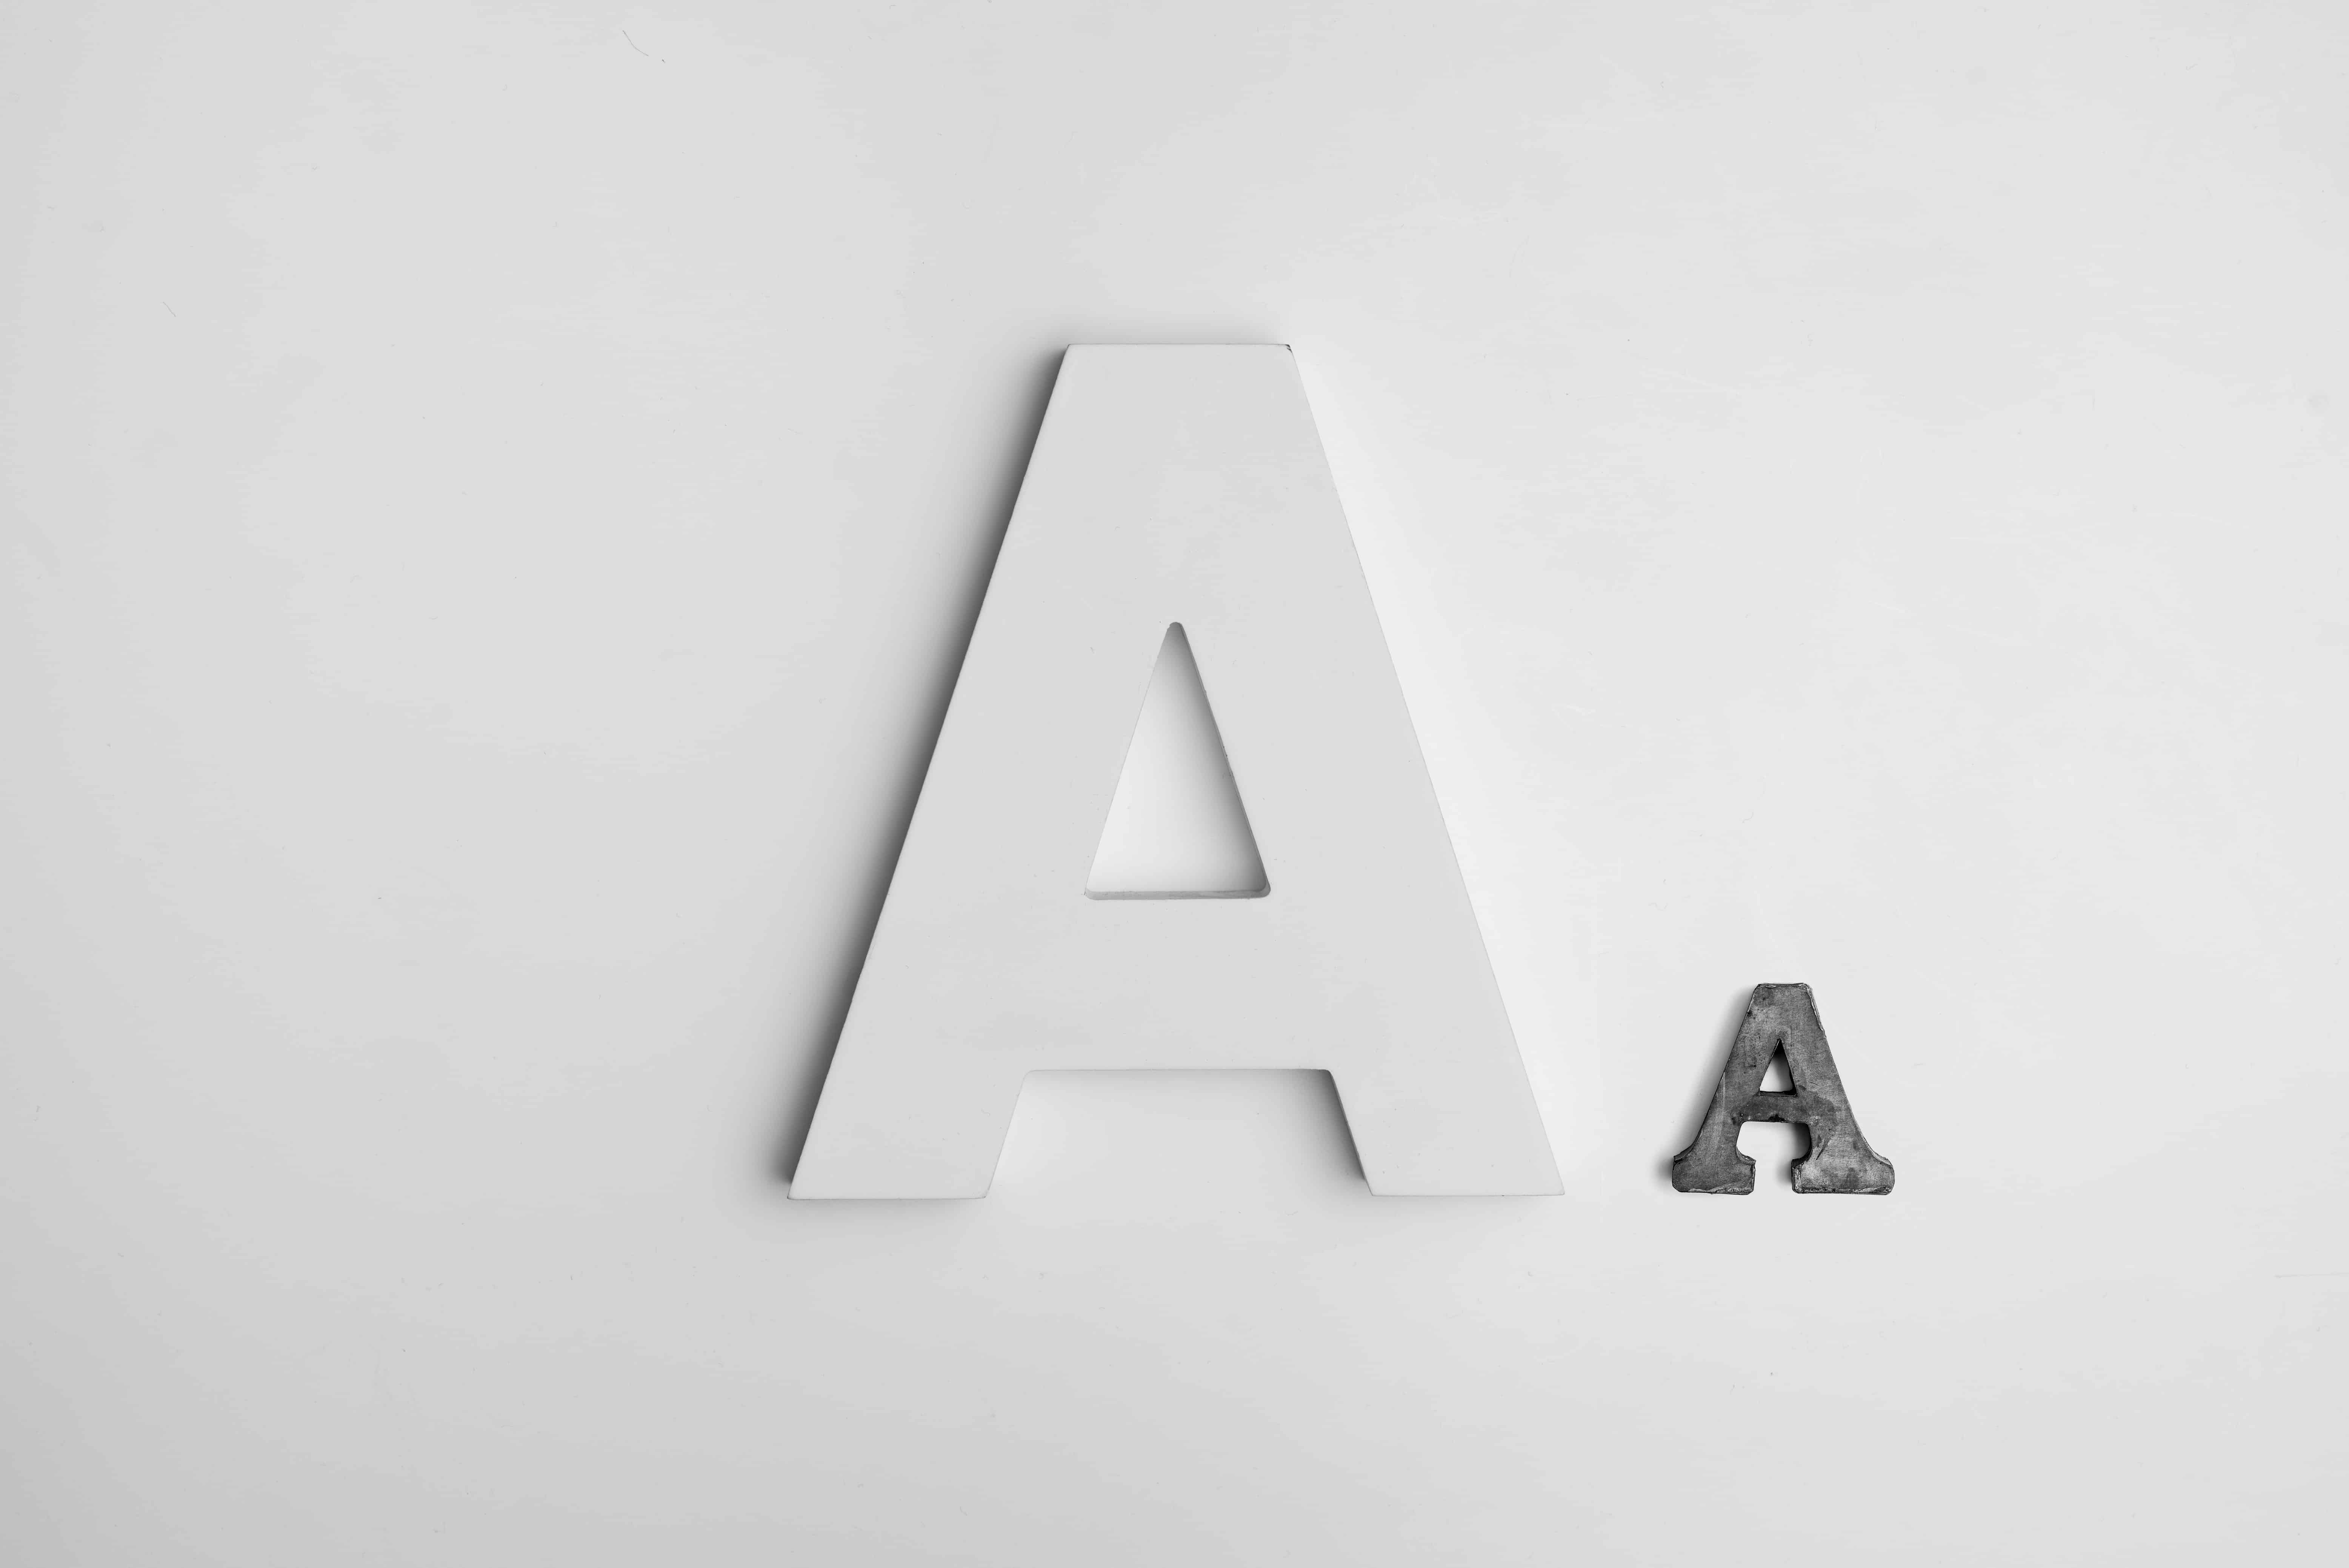 Blaze Experts' Branding Alphabet